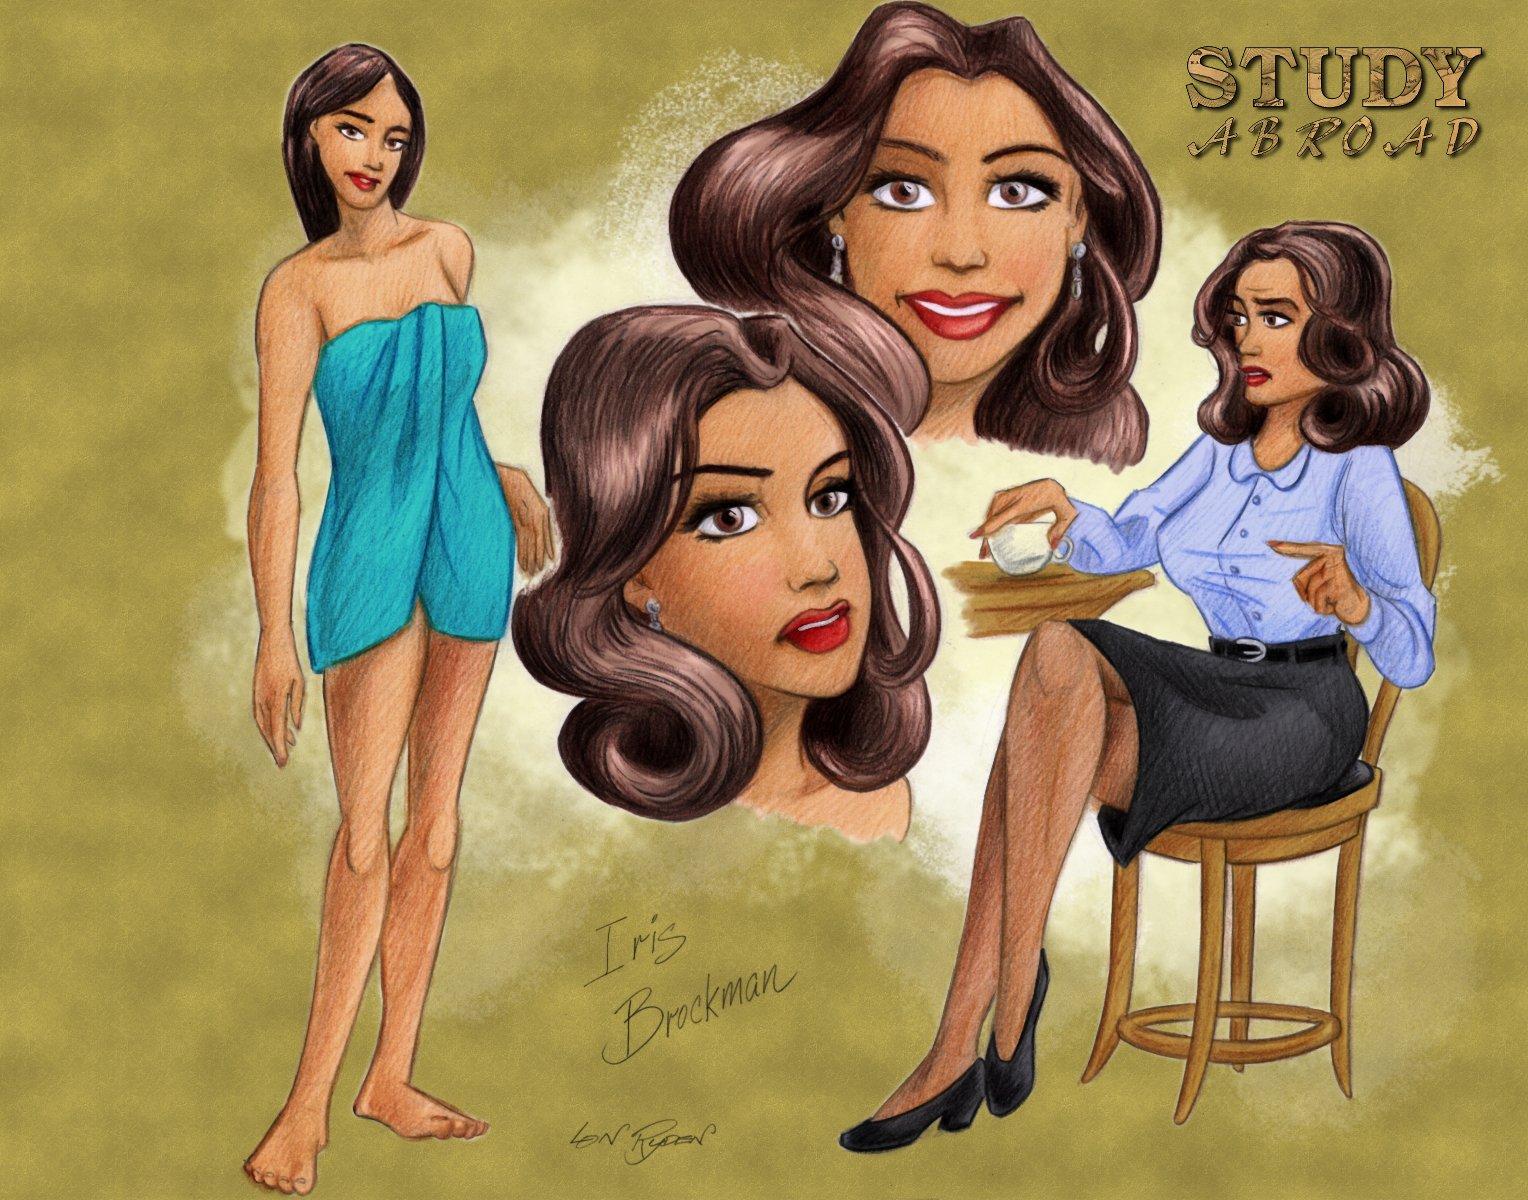 Lon Ryden's Iris Brockman design